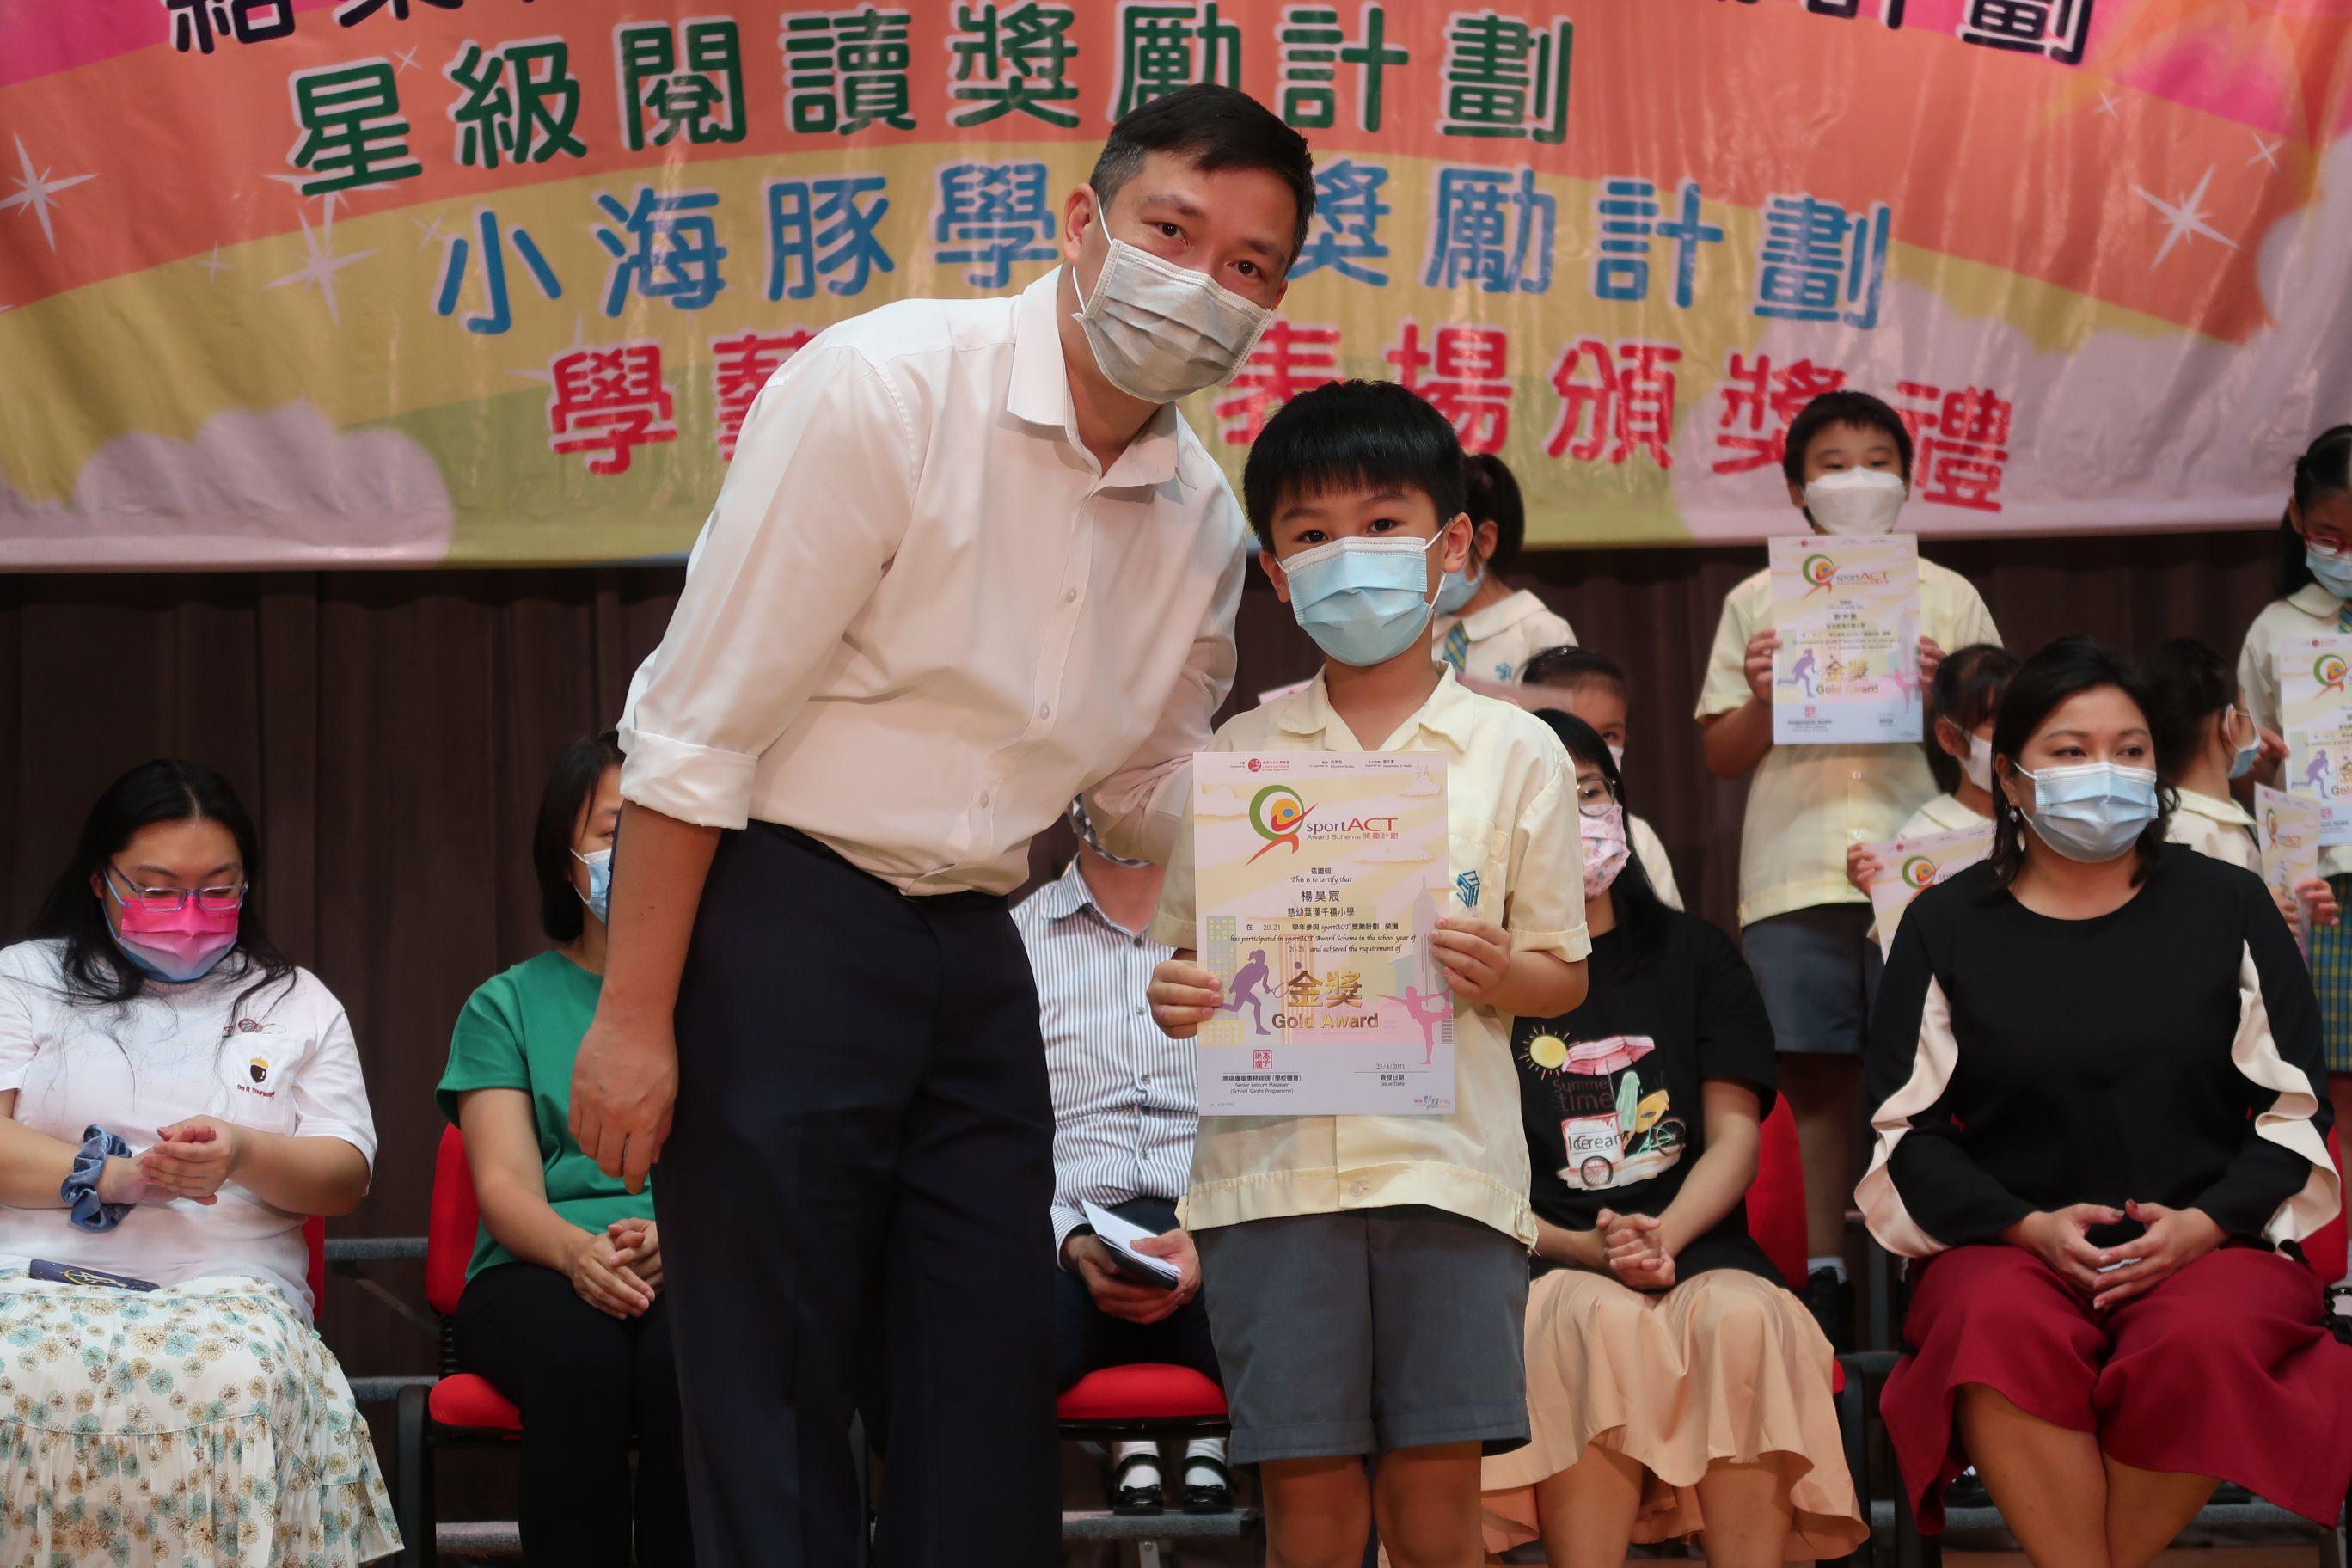 https://syh.edu.hk/sites/default/files/img_5903.jpg